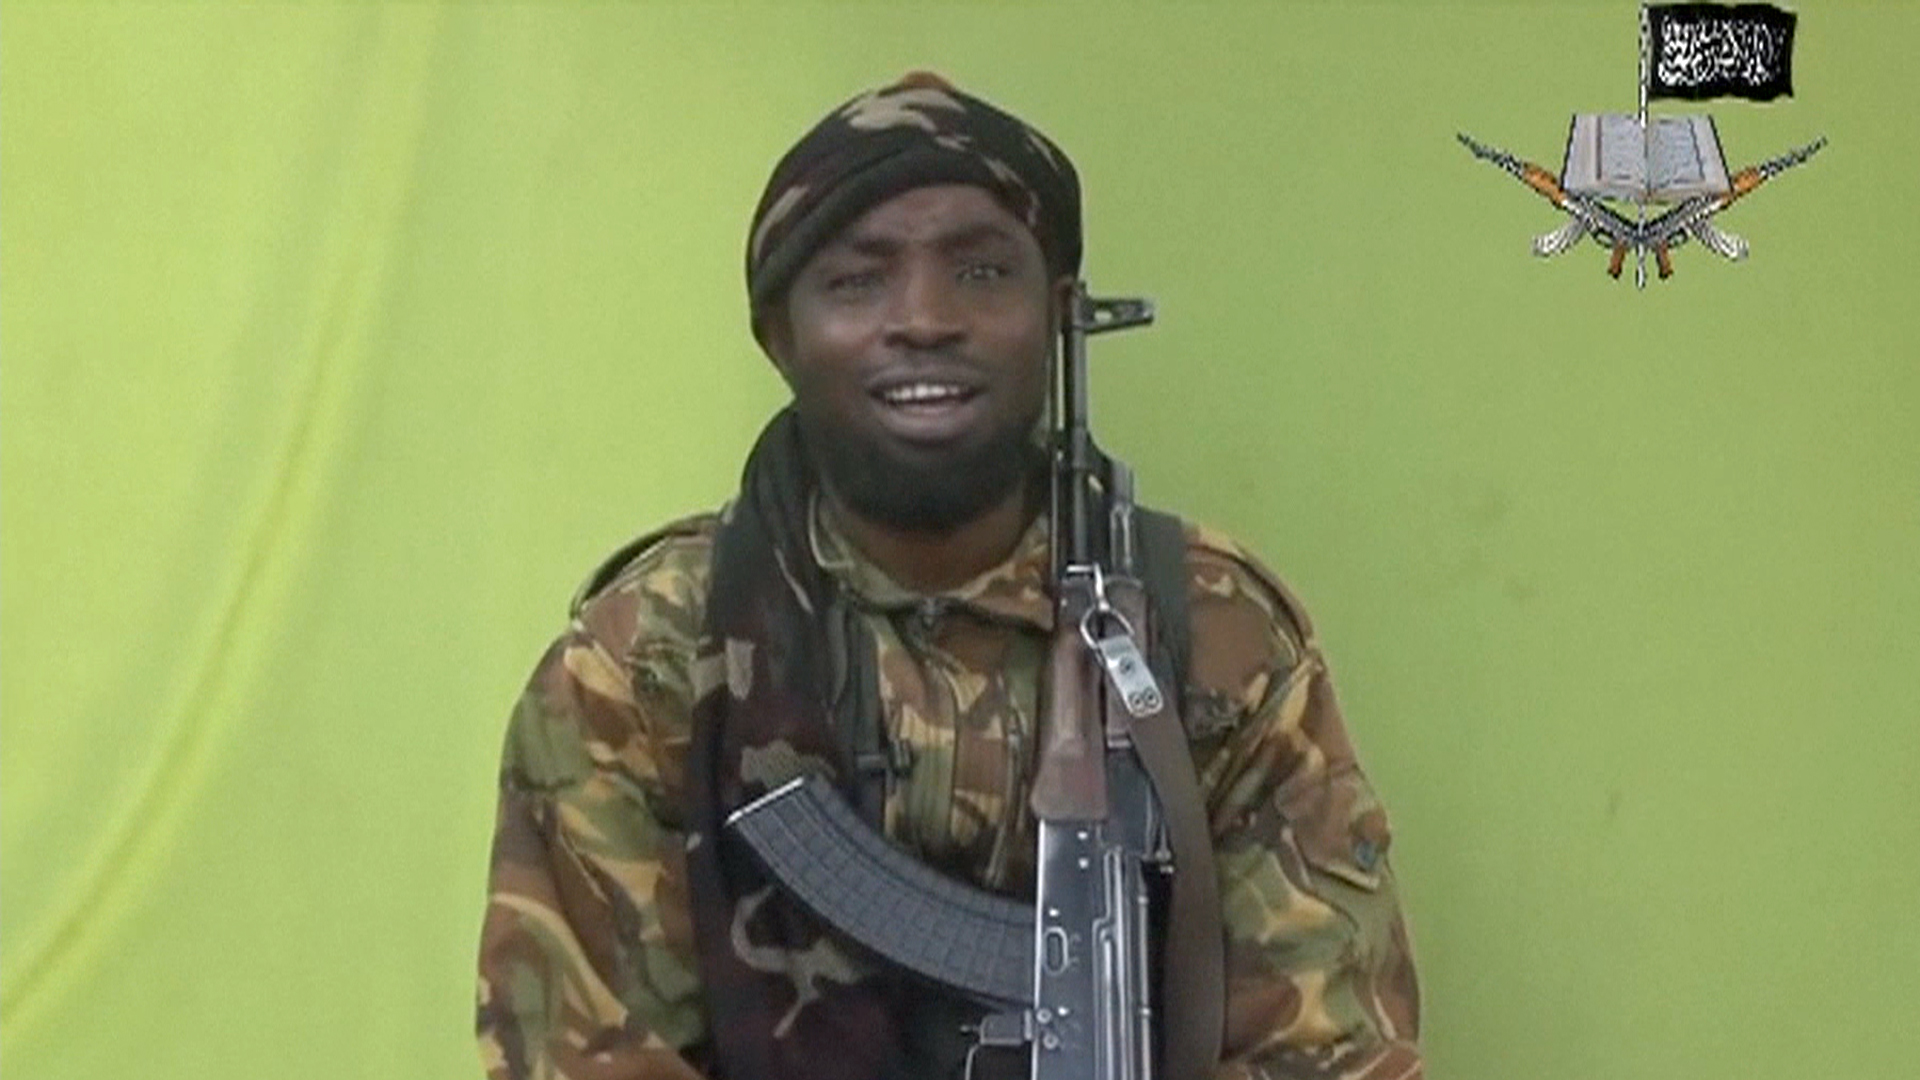 Missing Nigeria Schoolgirls: Where Boko Haram Gets Its Weapons